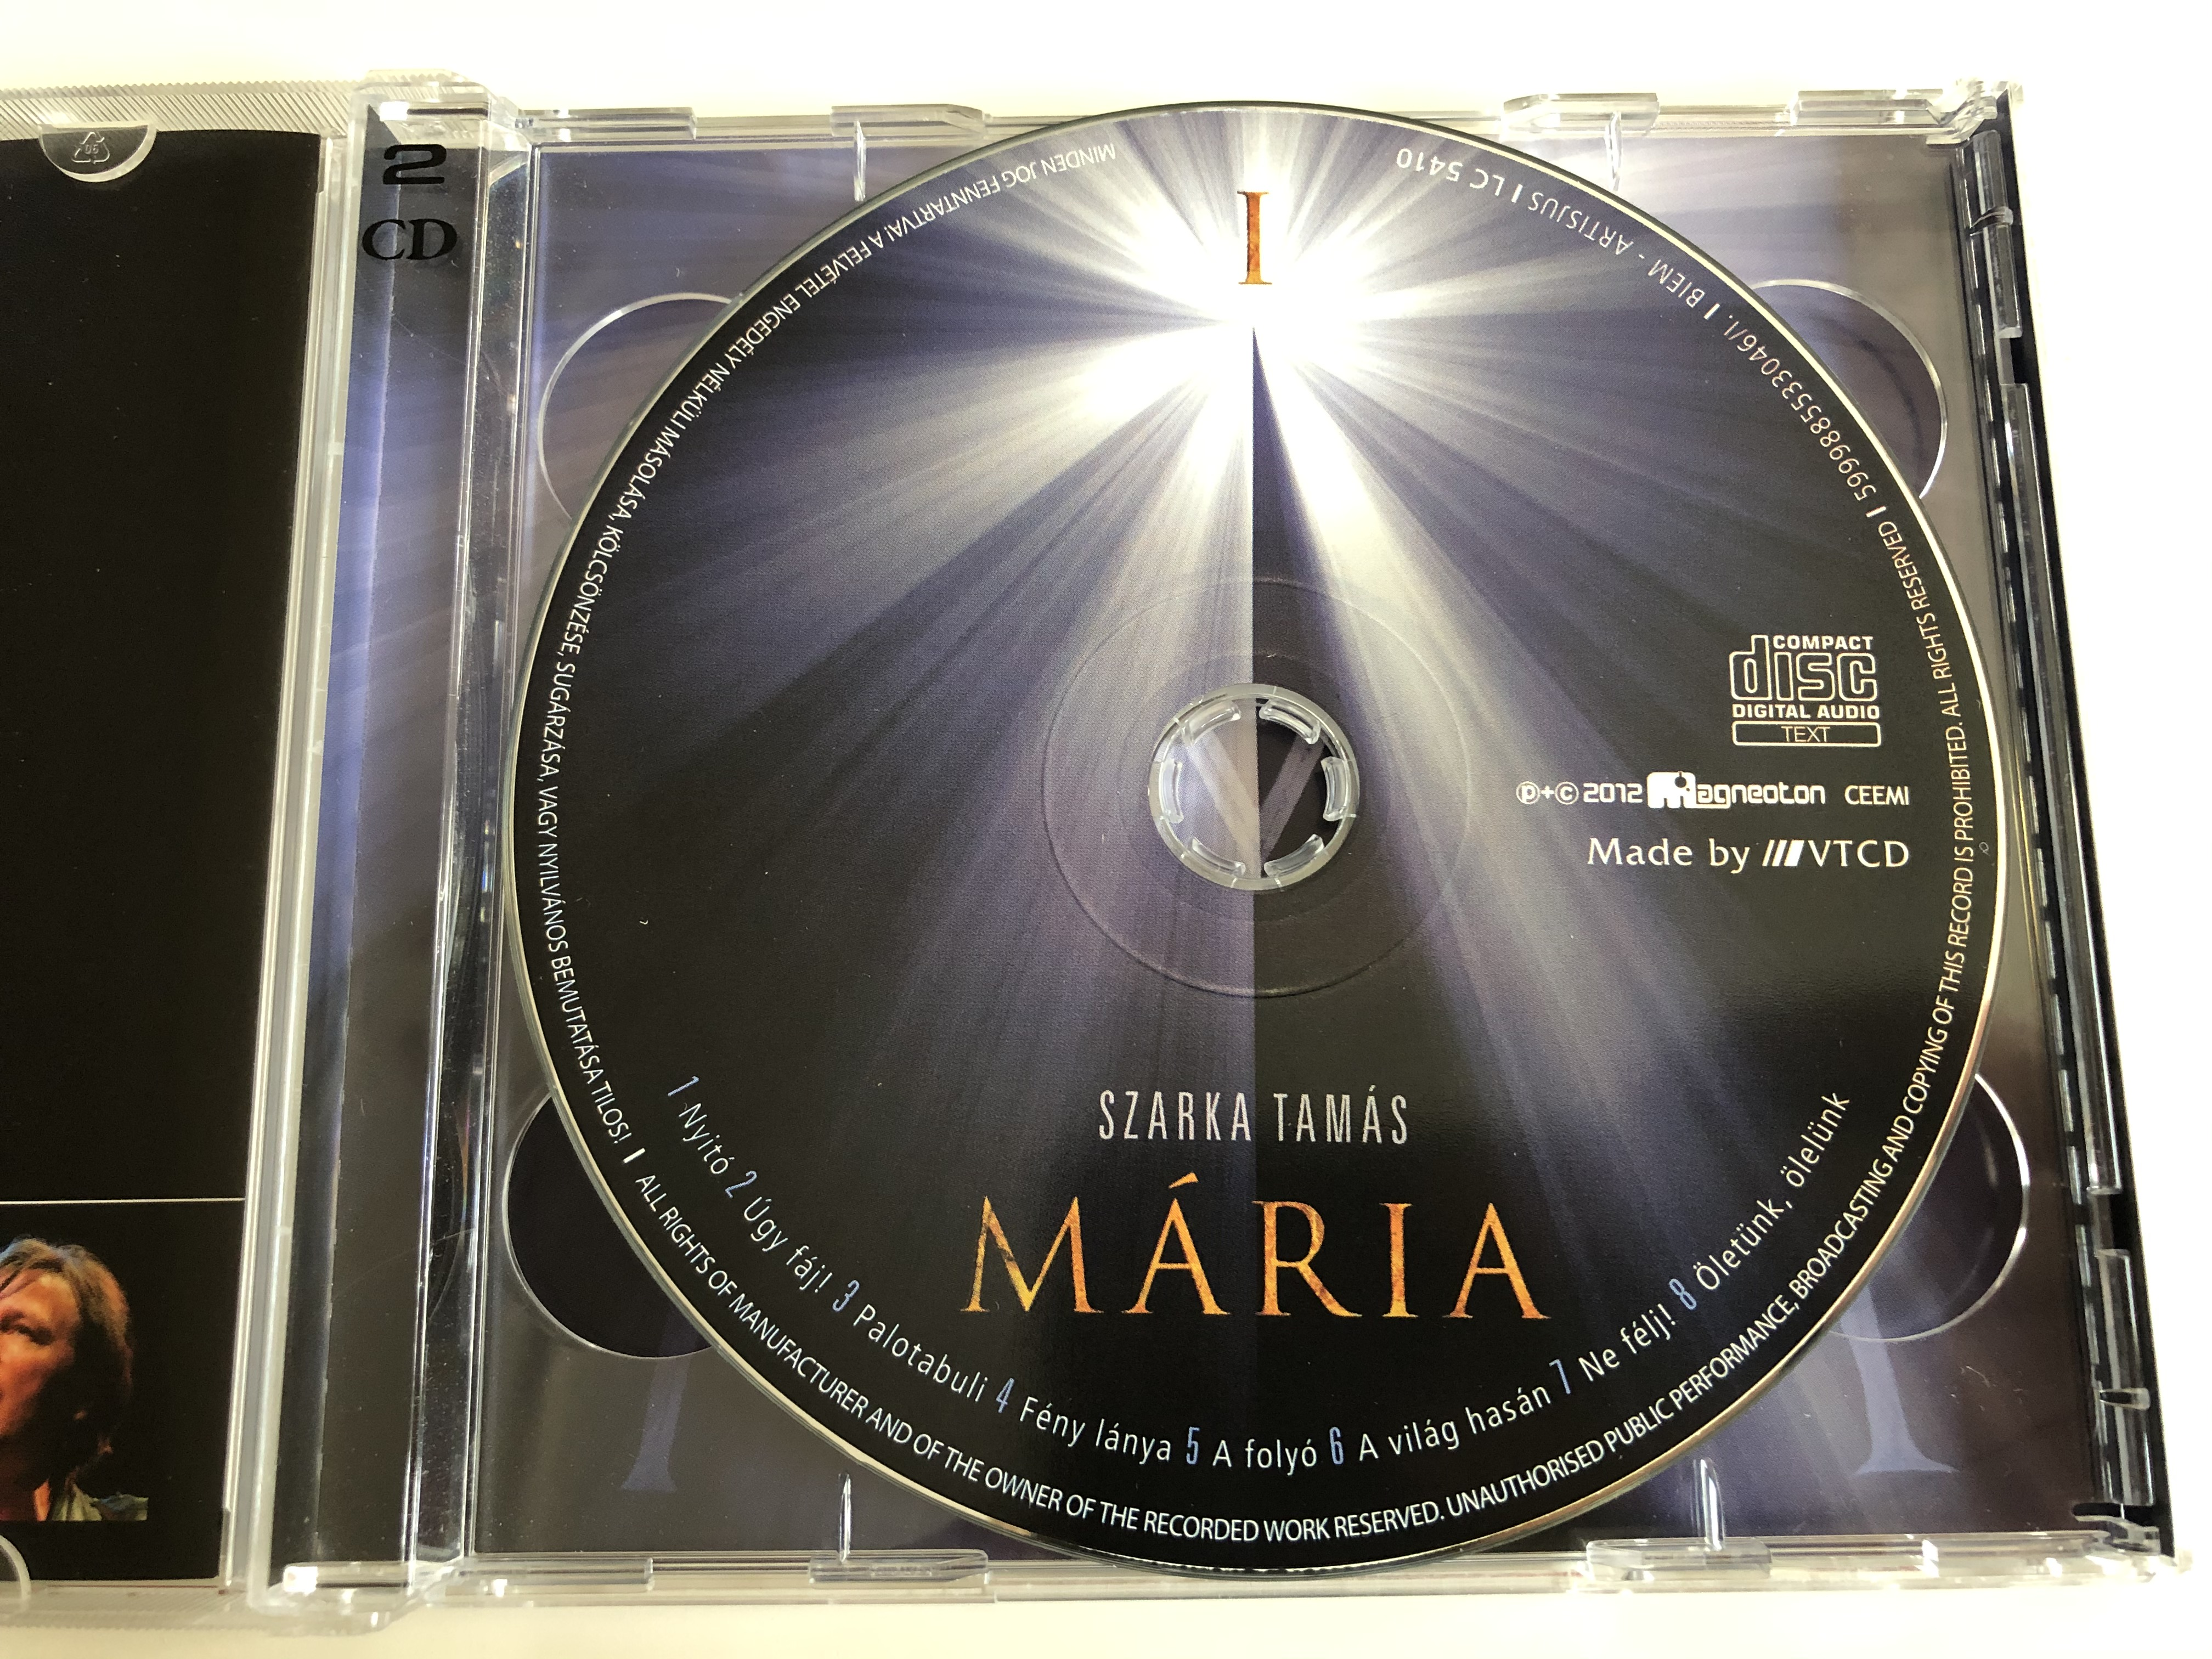 szarka-tamas-maria-musical-magneoton-2x-audio-cd-2012-5999885533046-3-.jpg